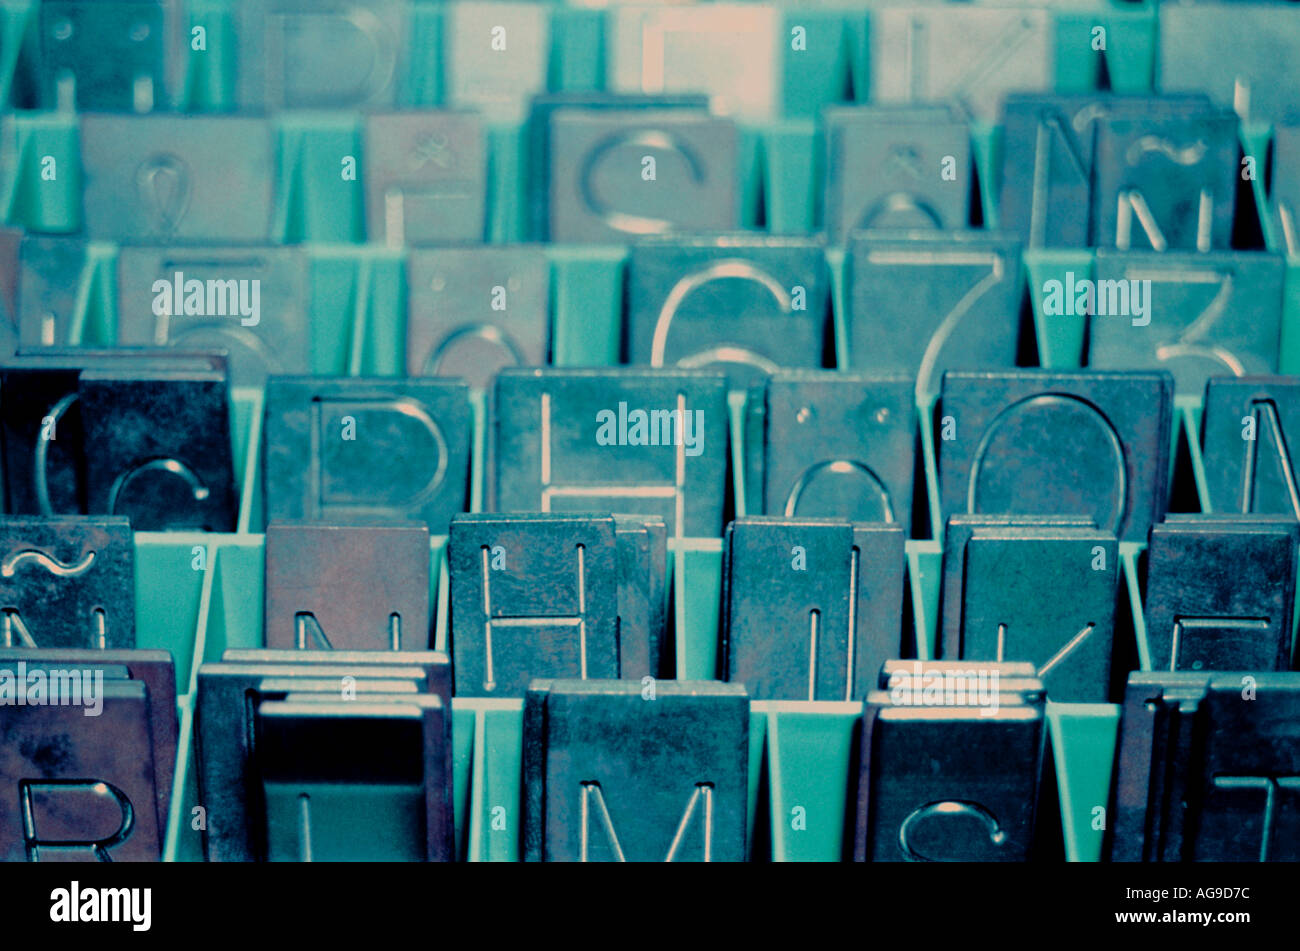 Stichplatten alphabet Stockbild